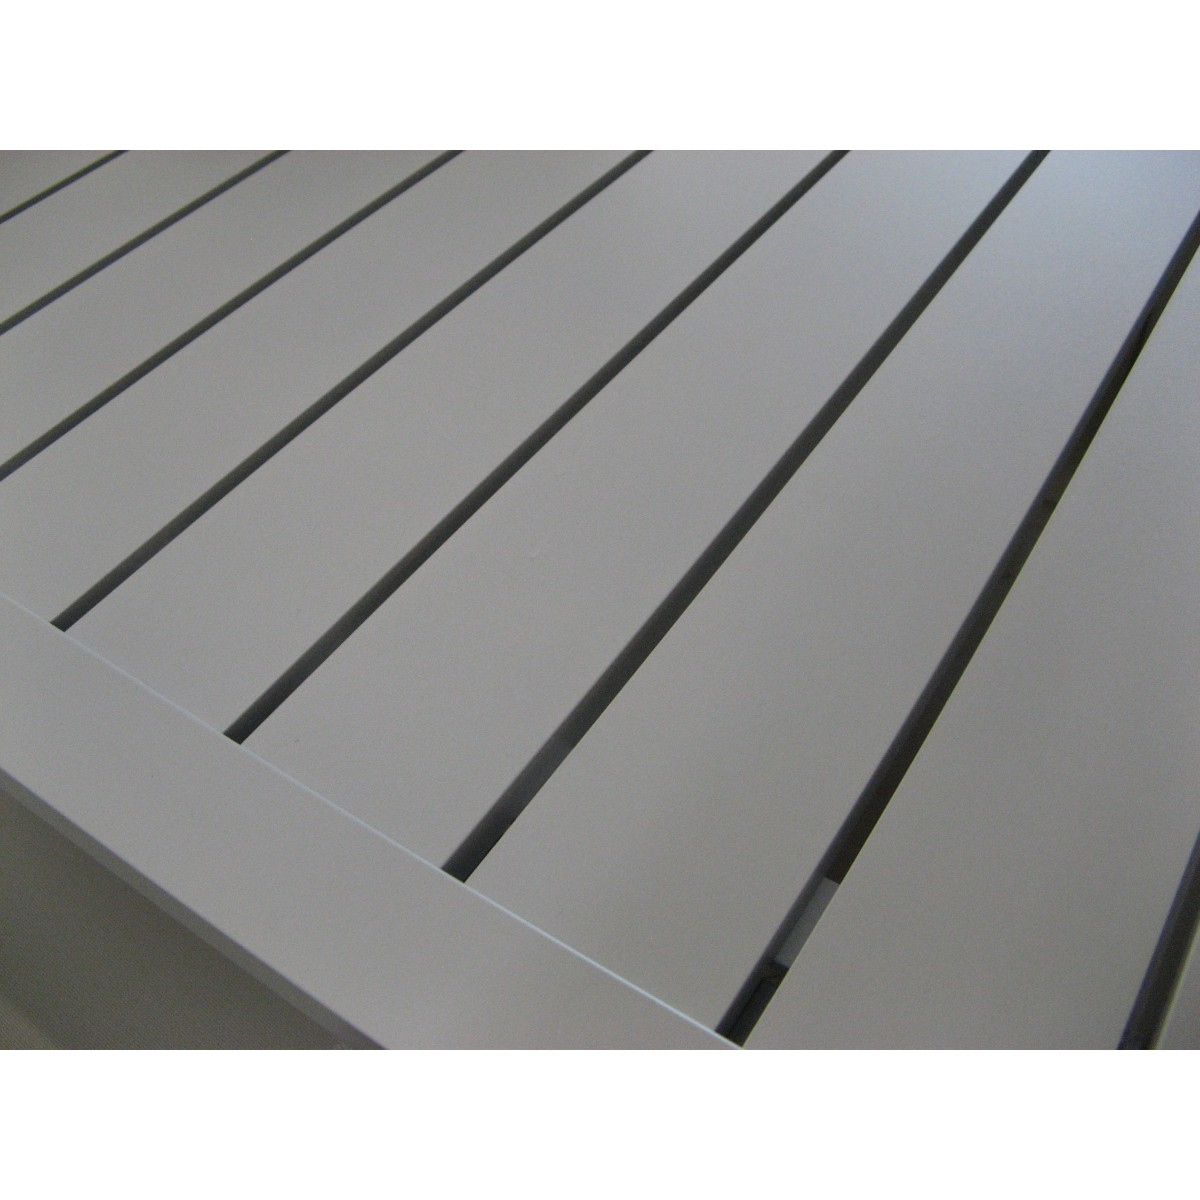 Table de repas en aluminium sp cial ext rieur en coloris for Table exterieur aluminium